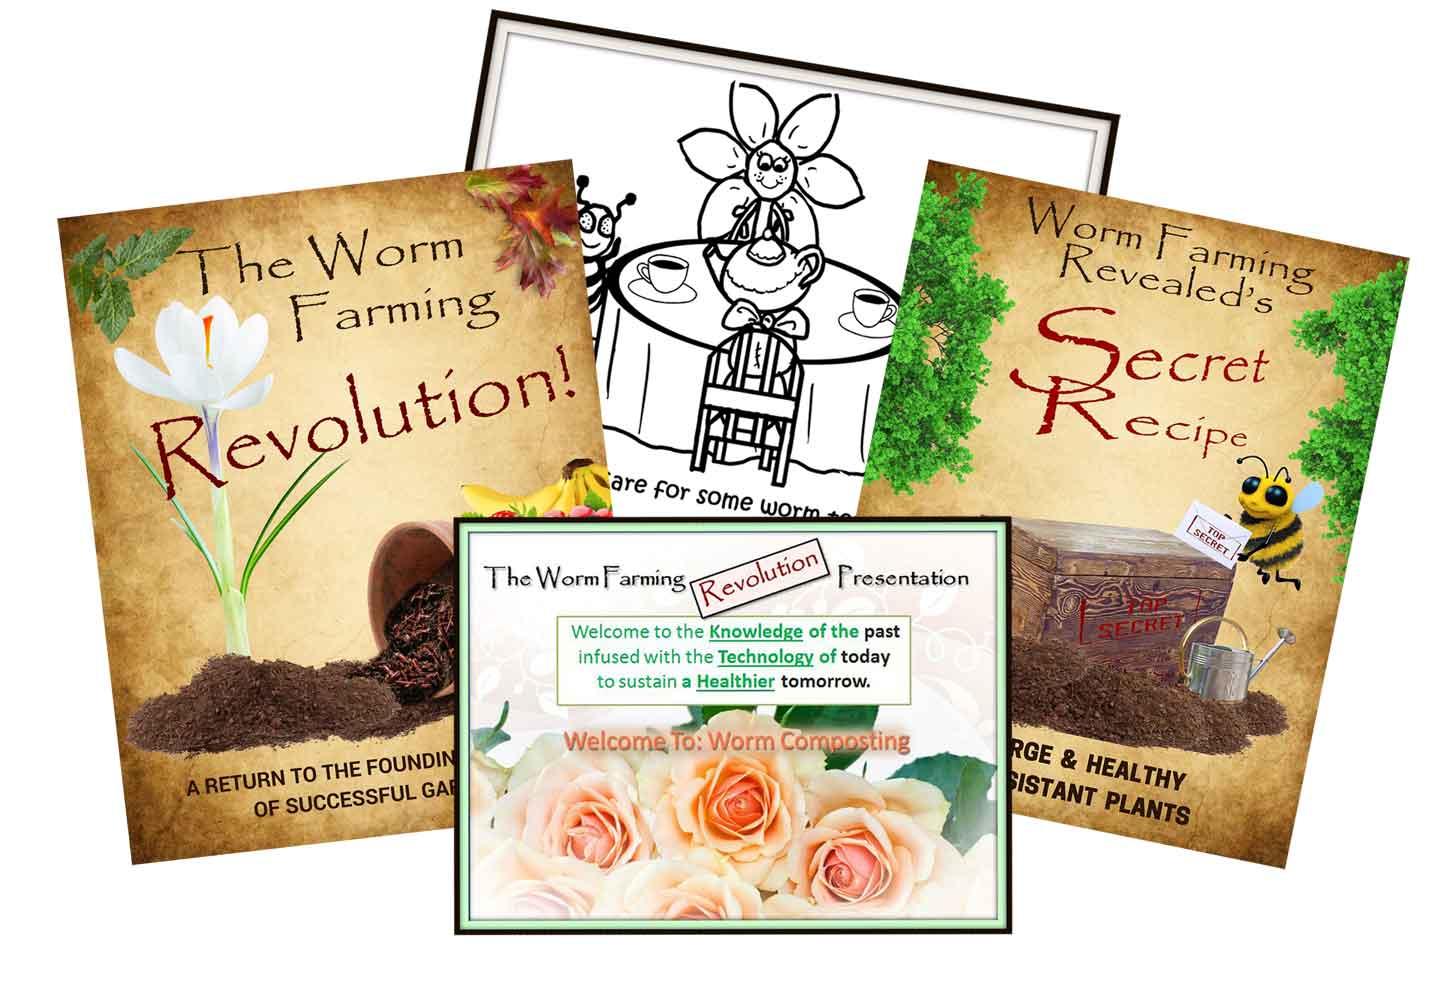 The Worm Farming Trilogy